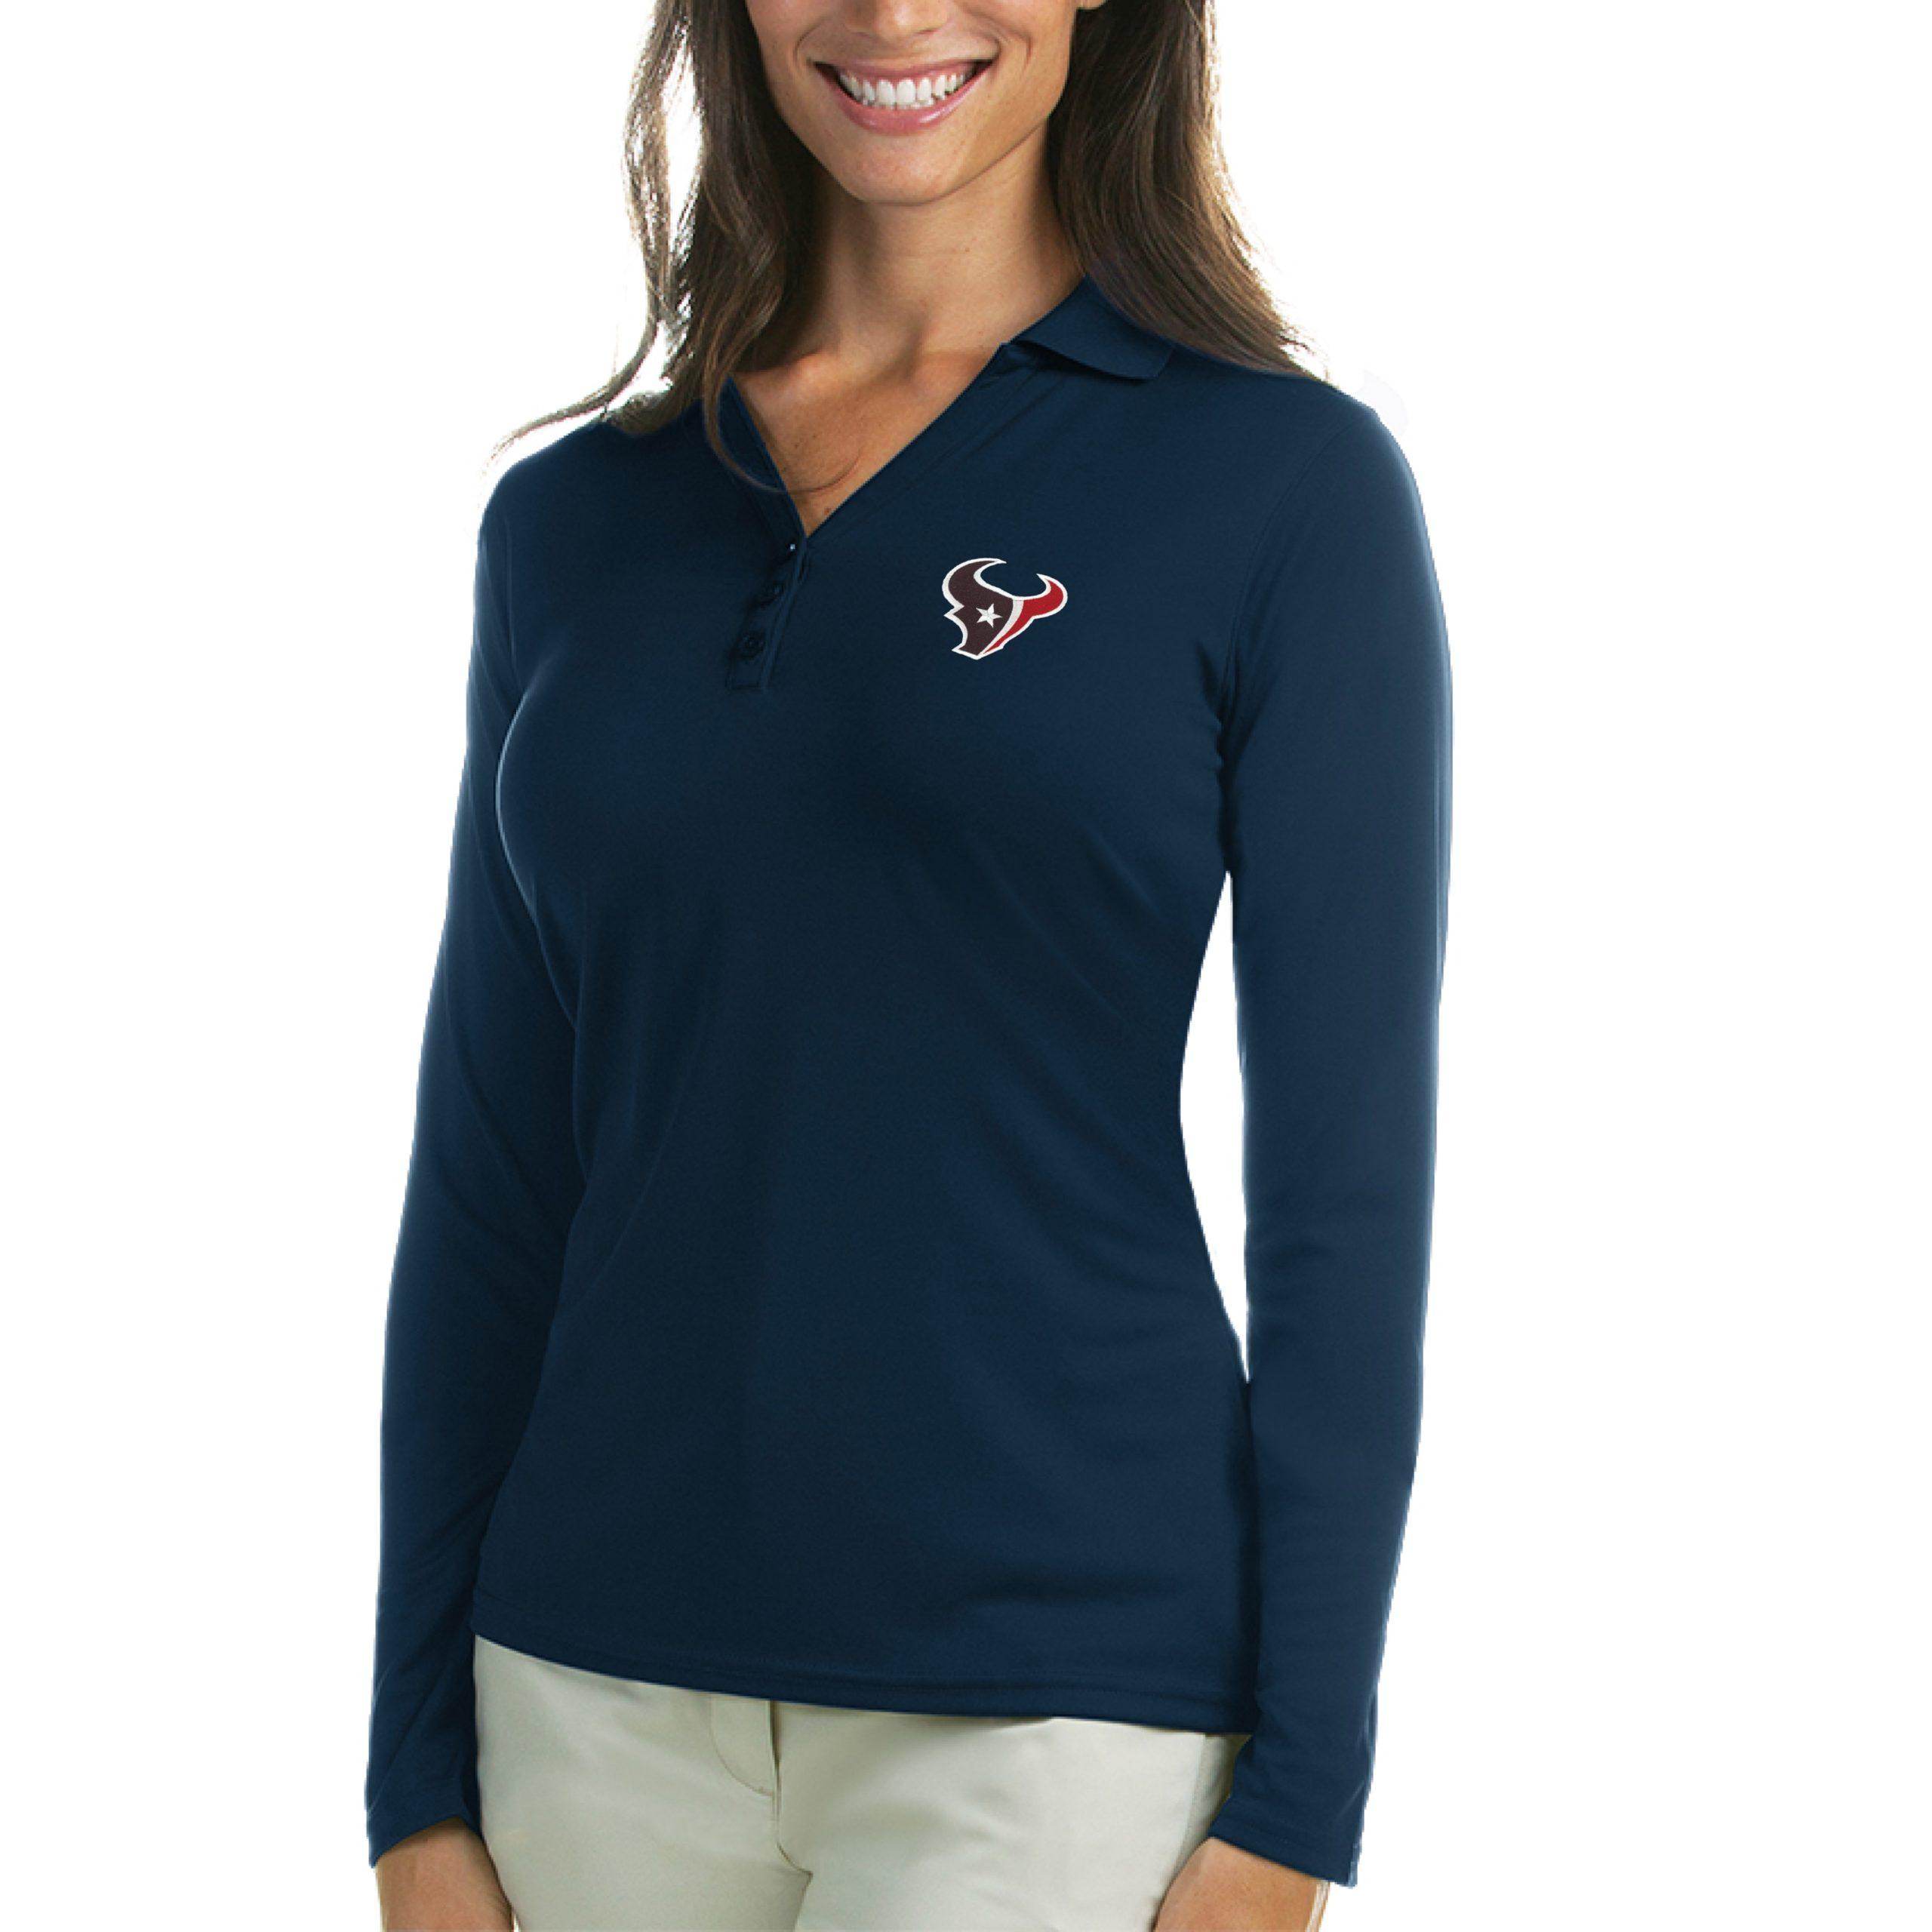 Houston Texans Antigua Women's Exceed Long Sleeve Polo - Navy